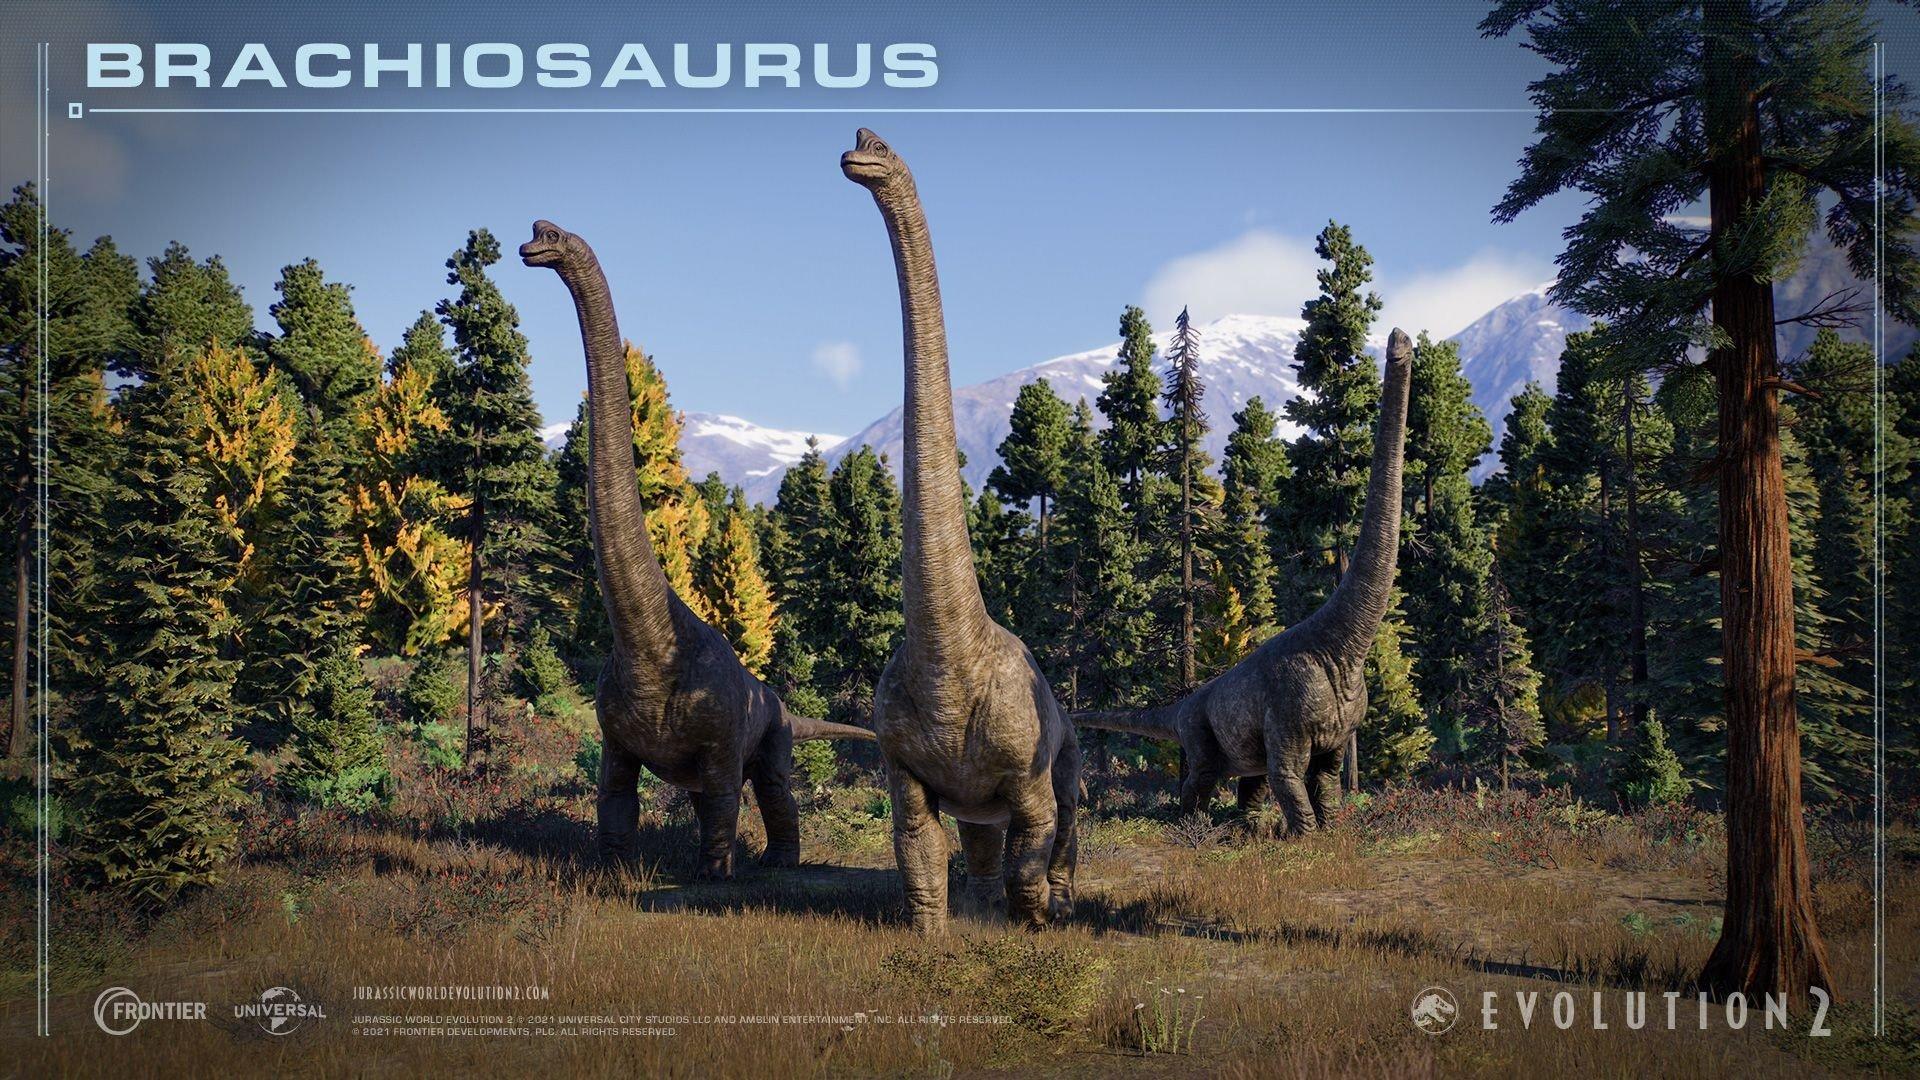 Jurassic-World-Evolution-2-Brachiosaurus